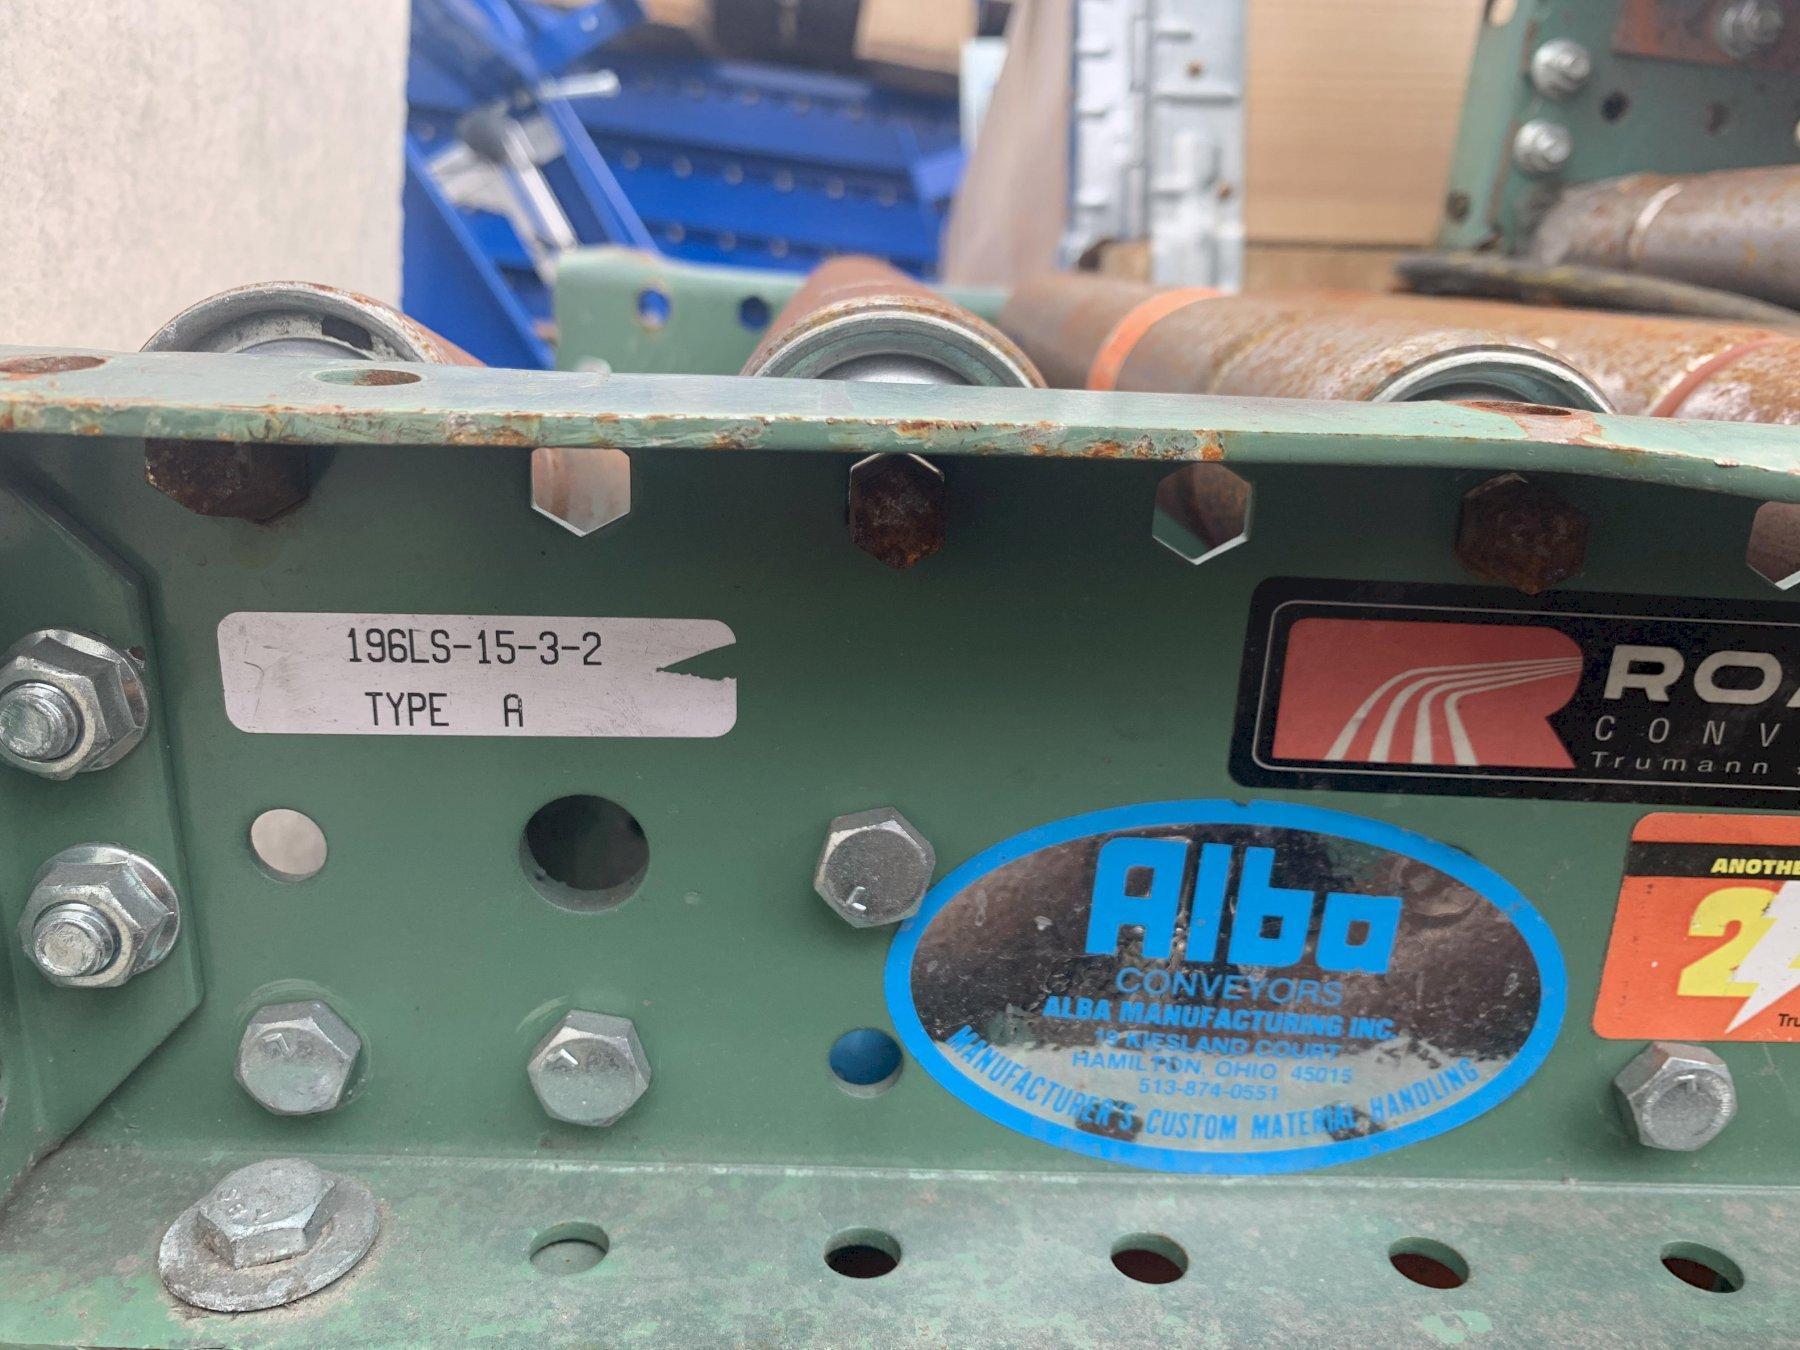 "350' X 14-3/4"" WIDE ROACH POWERED ROLLER CONVEYOR: STOCK #11351"